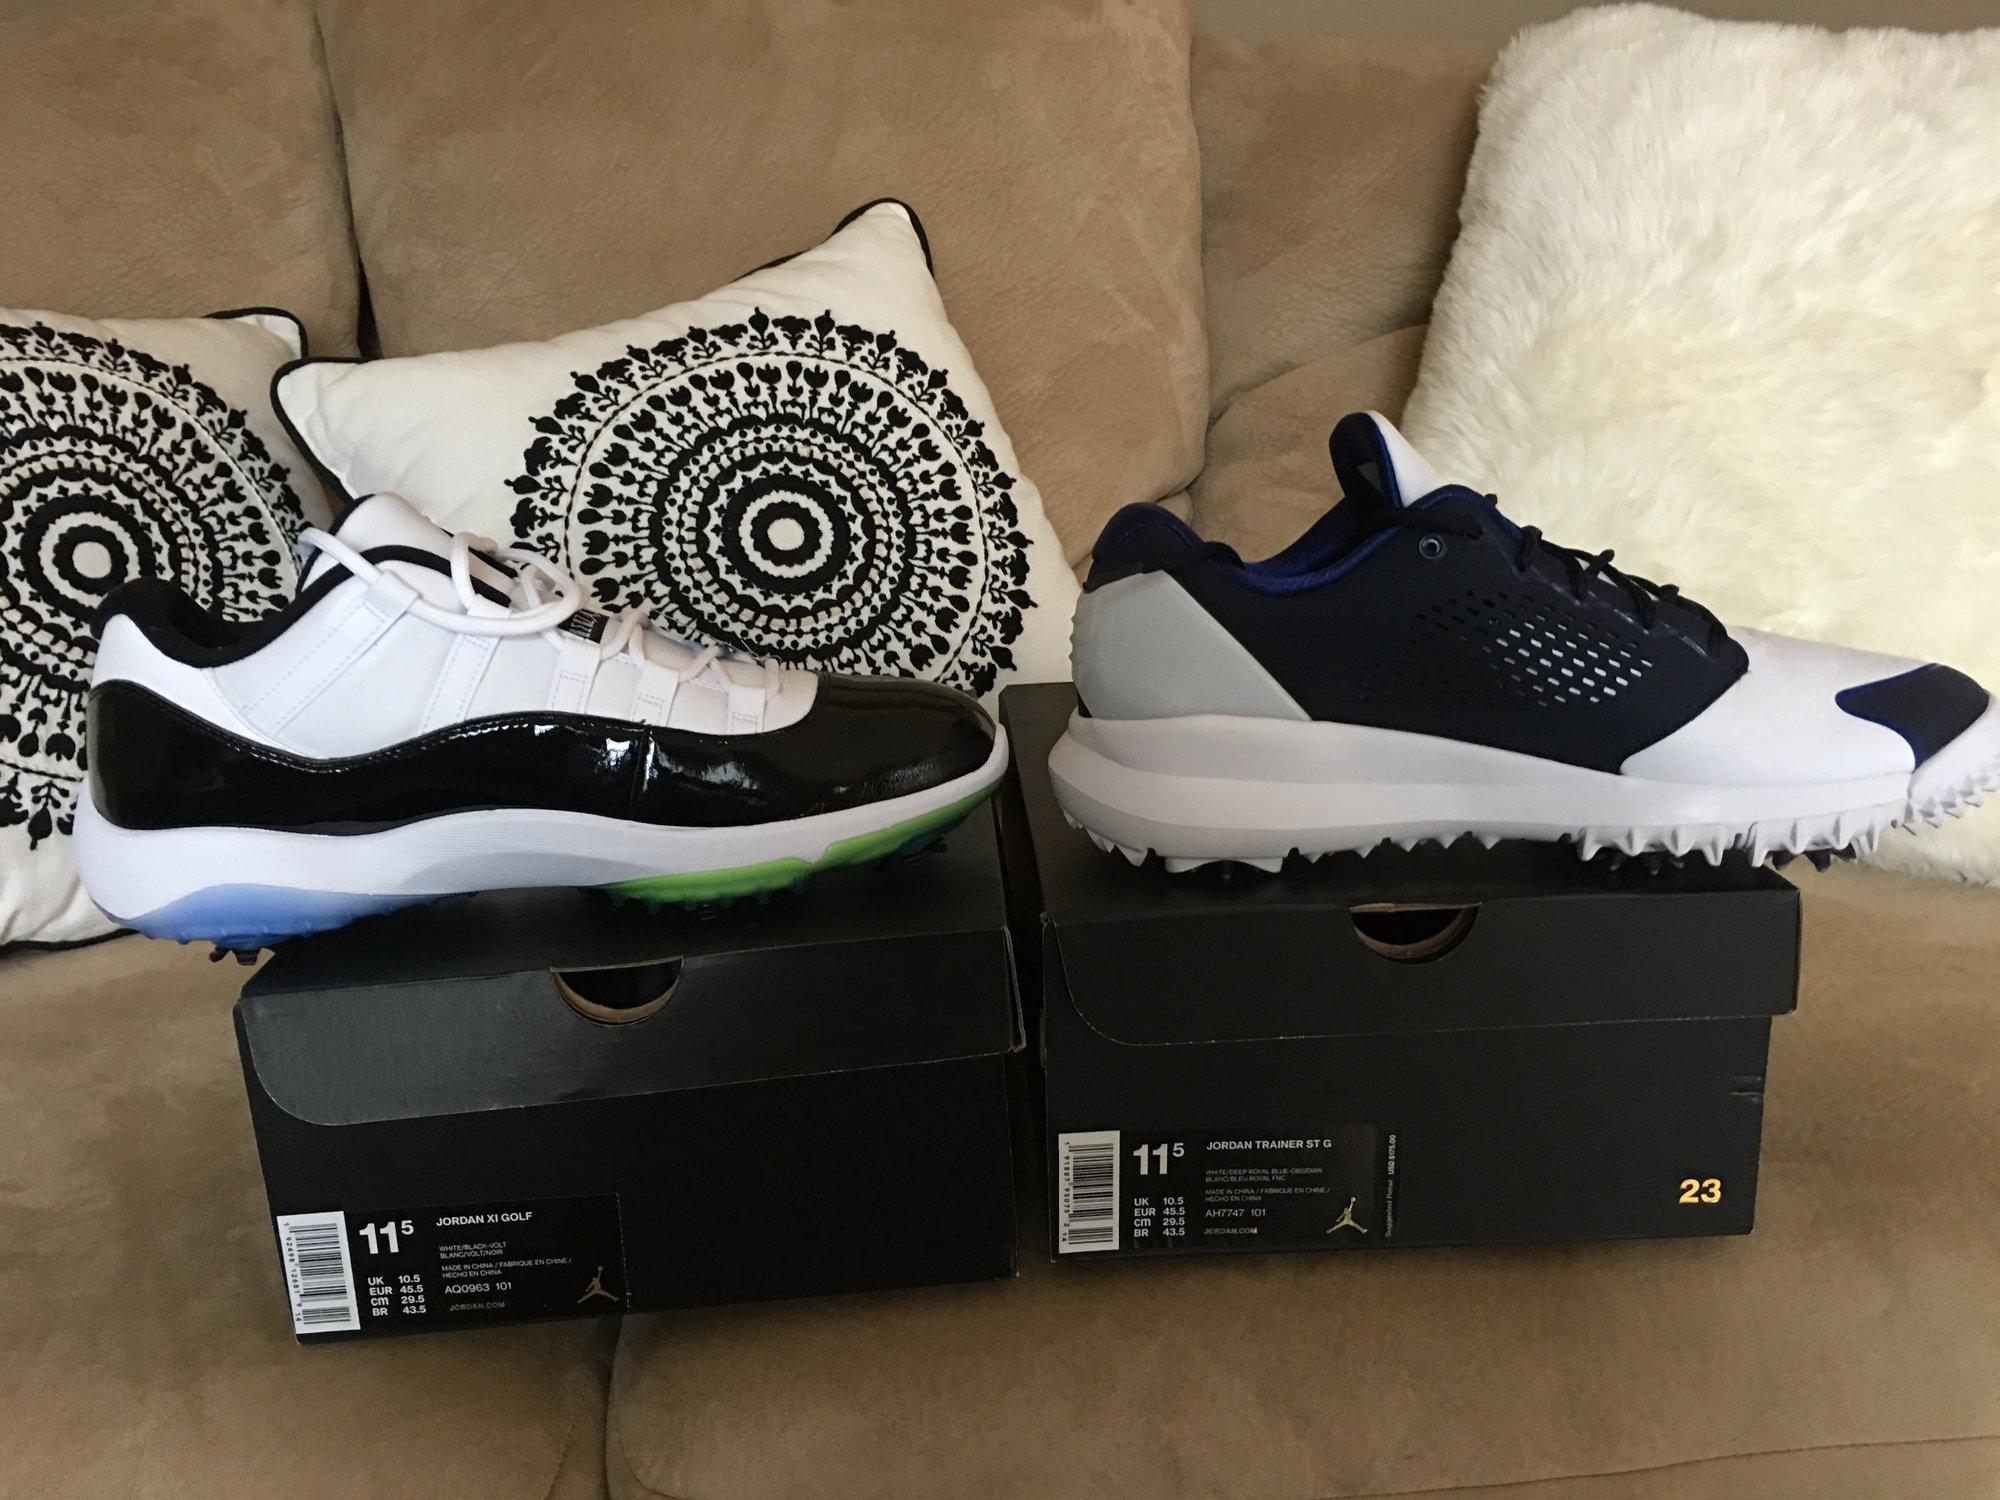 super popular 90f93 c9ae3 Jordans size 11.5 - Retro 11 and ST G trainer — GolfWRX